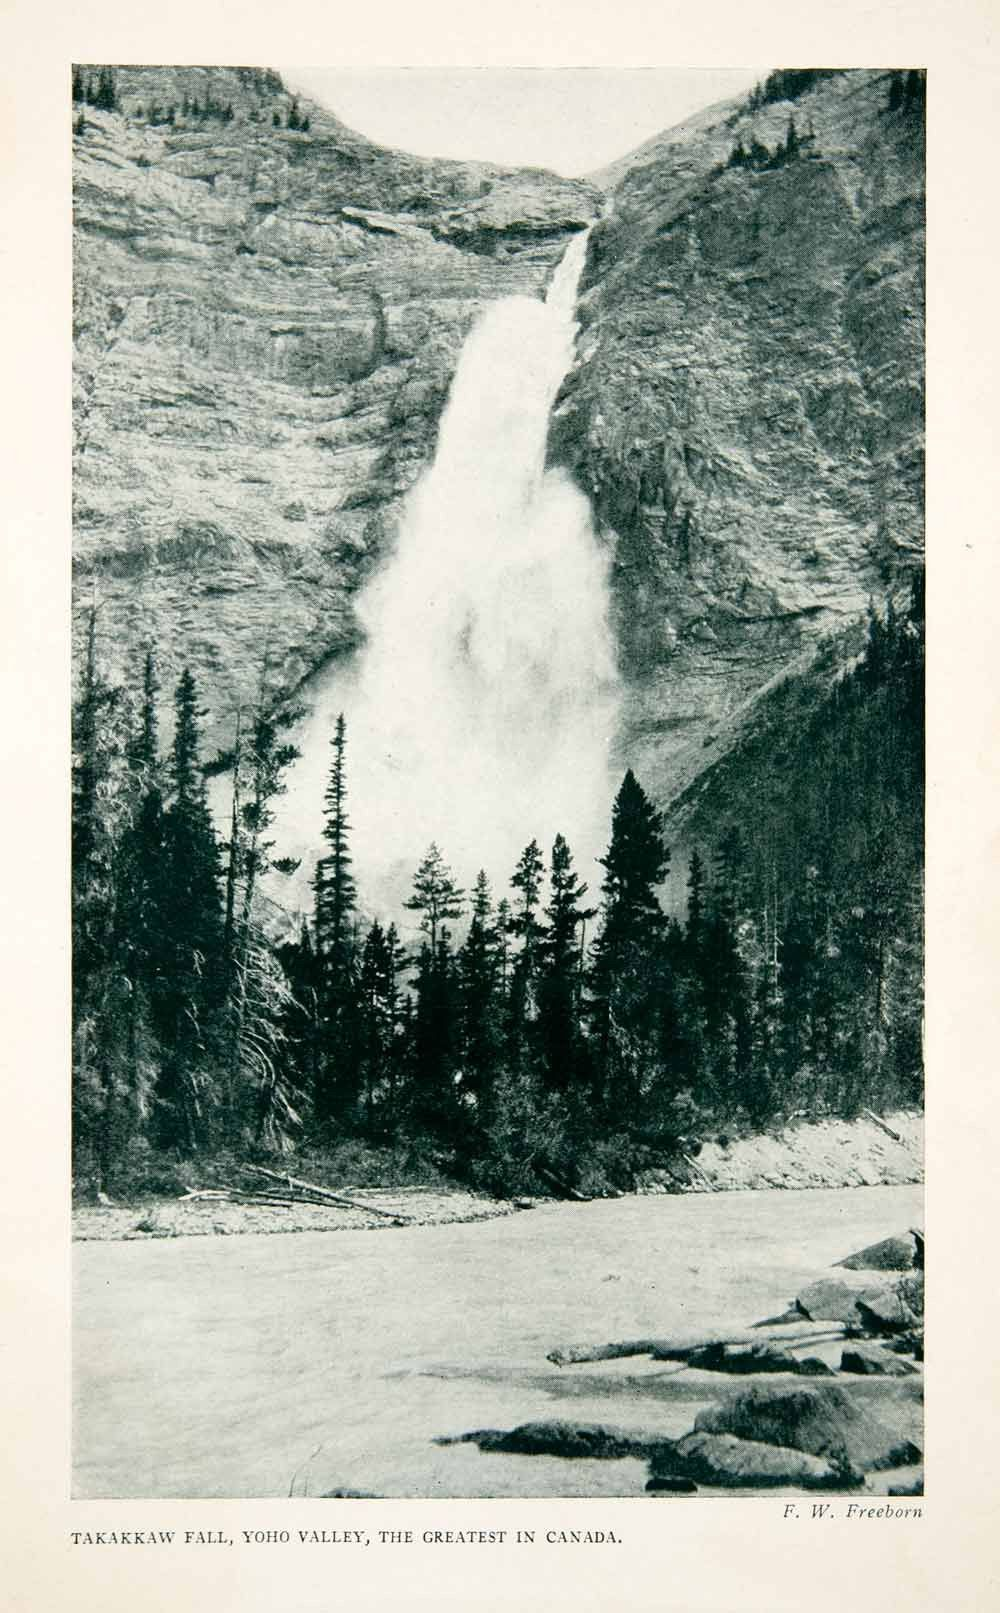 1922 Print Takakkaw Falls Yoho Valley Canada Landscape Mountain Tree Park Xgnb2 Canada Landscape Landscape Scenery